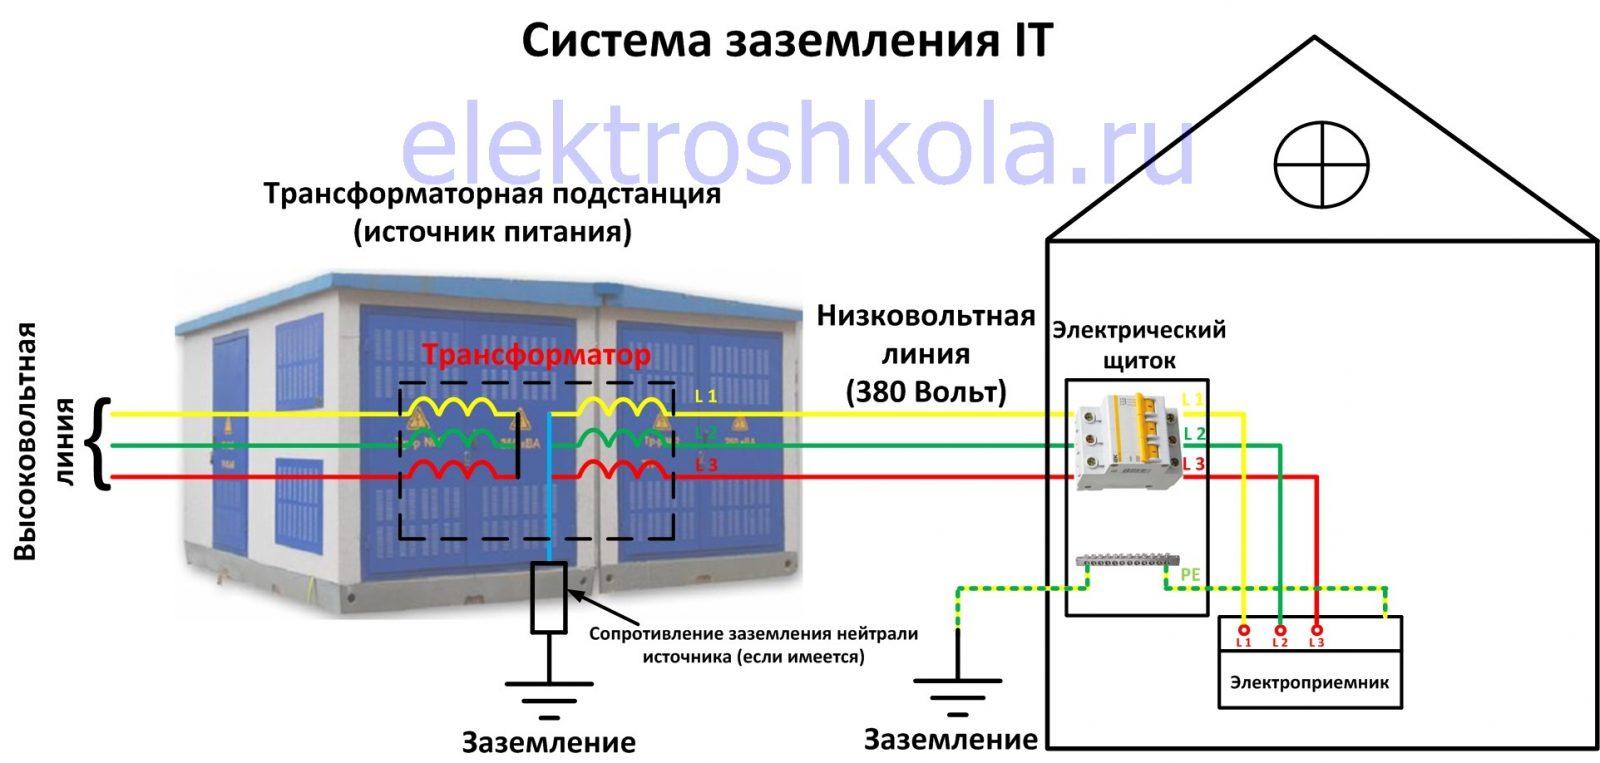 система заземления IT схема